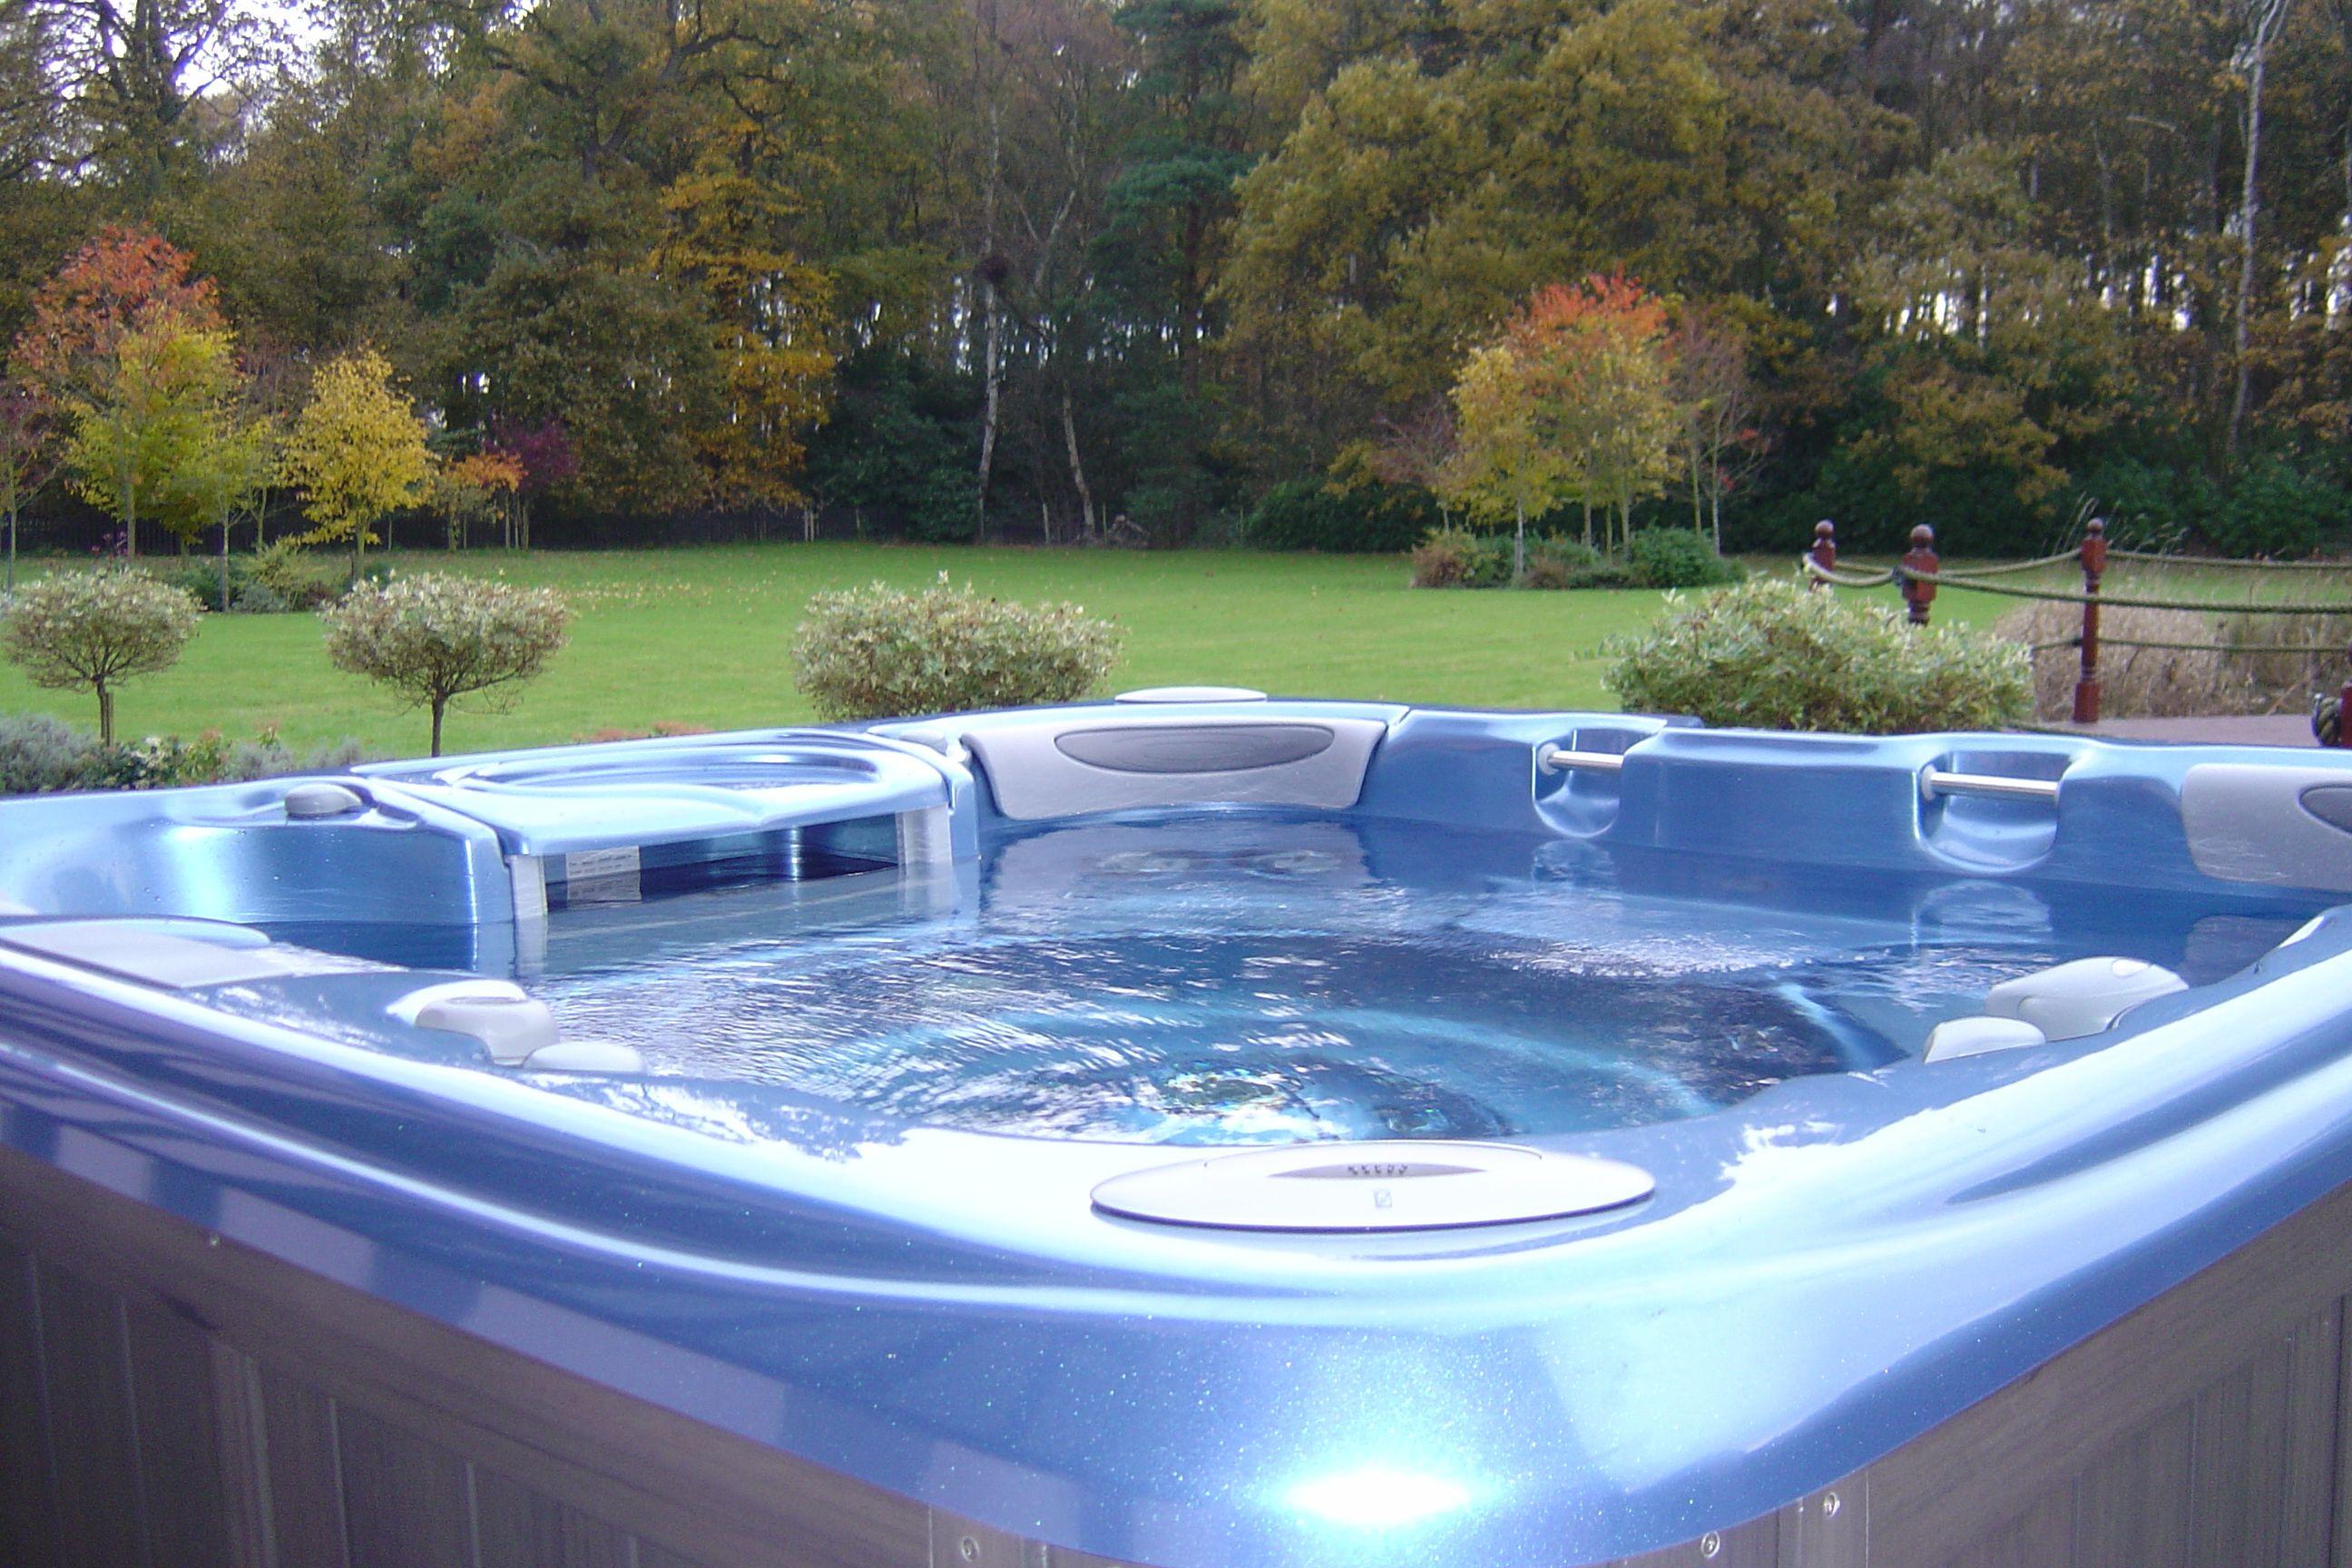 sundance spa 880 series optima installed near alderley edge in cheshire hot tub installs. Black Bedroom Furniture Sets. Home Design Ideas